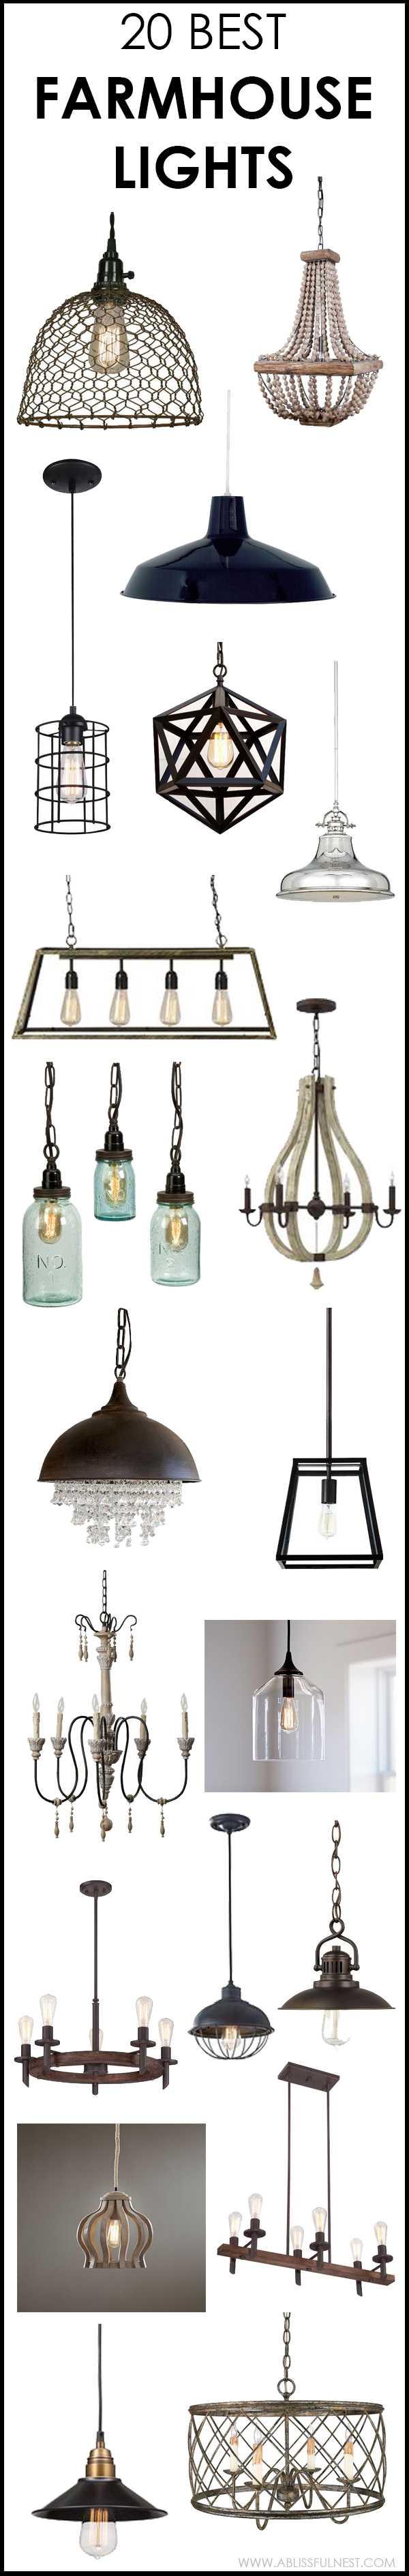 farmhouse lights 20 amazing styles to